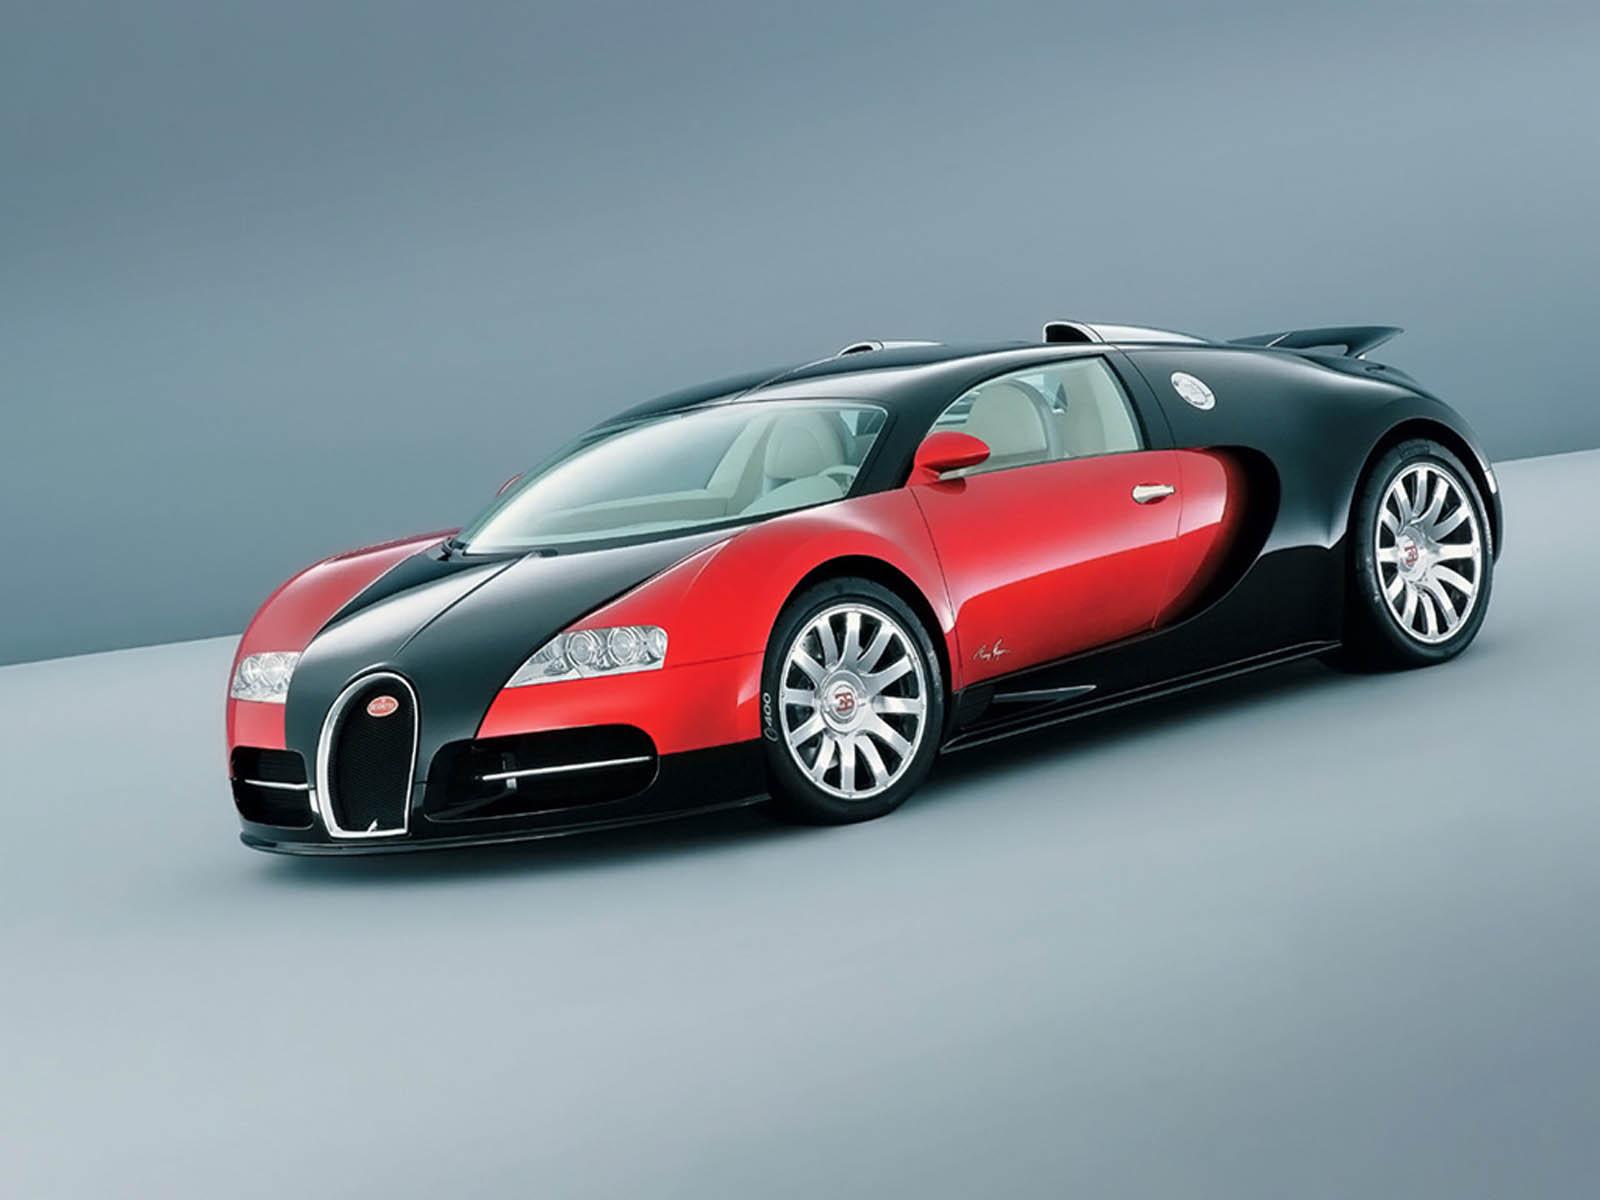 Bugatti Cars 12 High Resolution Car Wallpaper